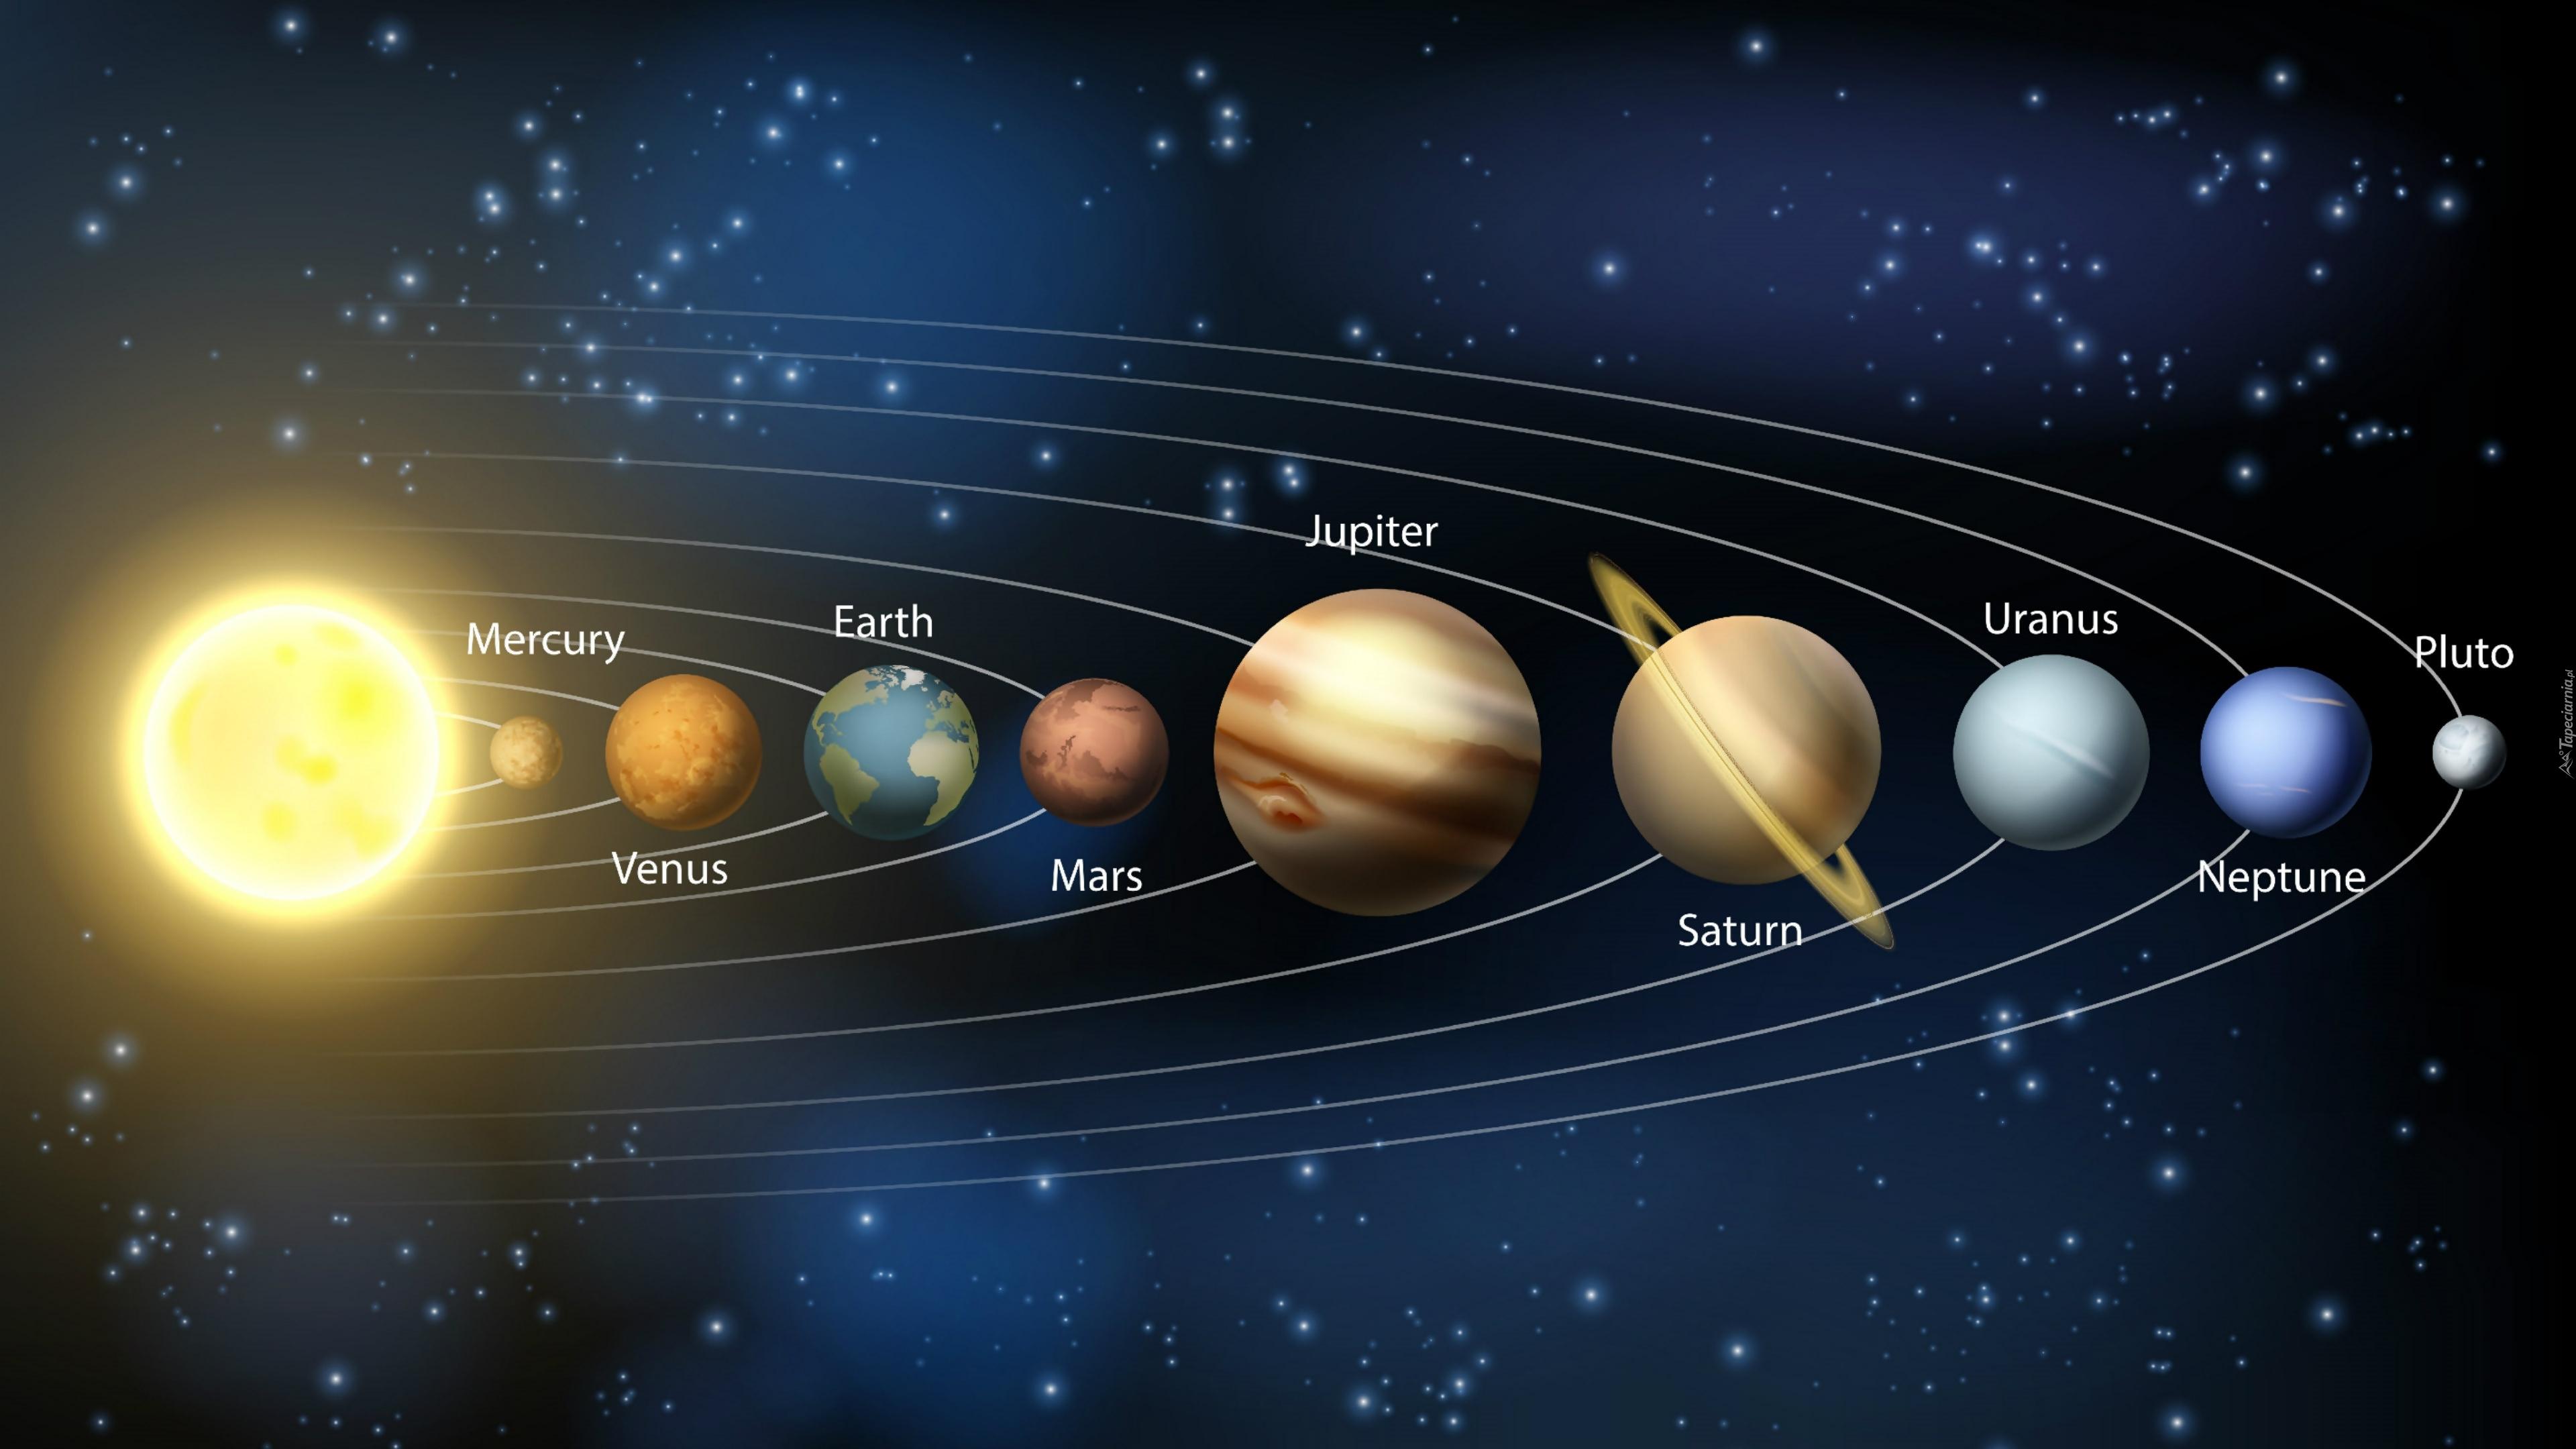 Znalezione obrazy dla zapytania planety